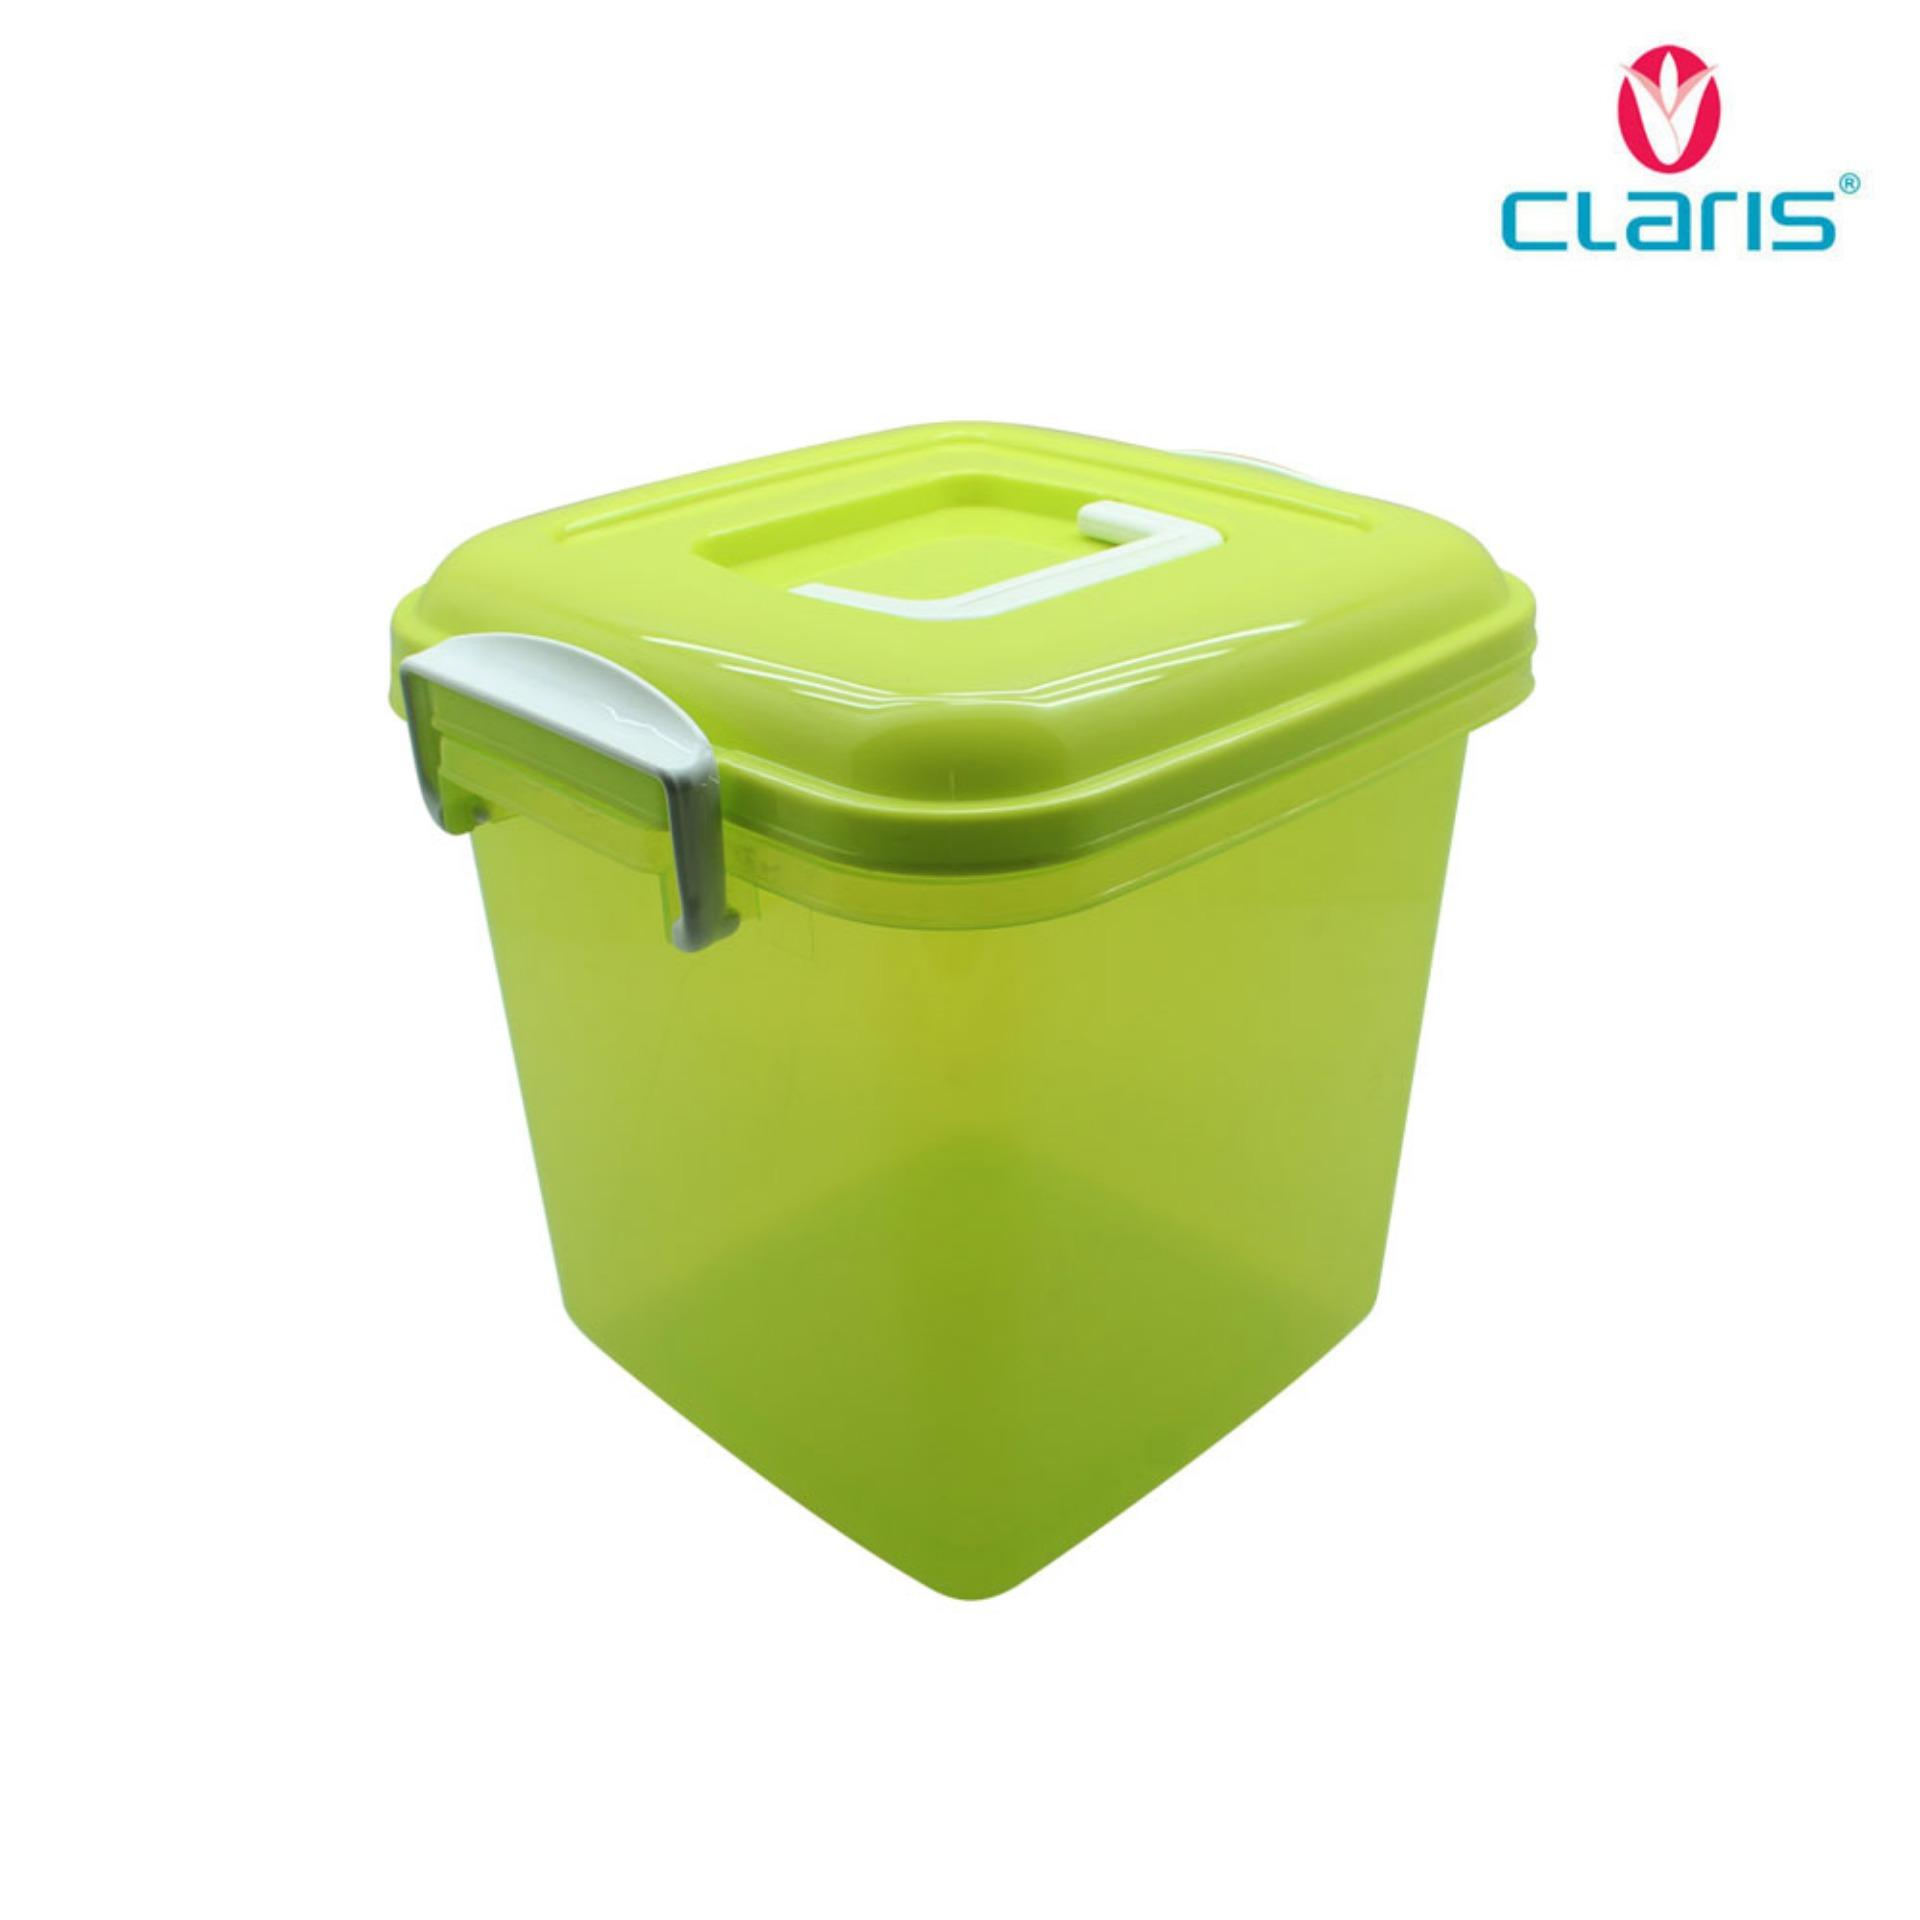 Claris Kotak Piknik / Kotak serbaguna / Box Q-Bic + Hd 1056